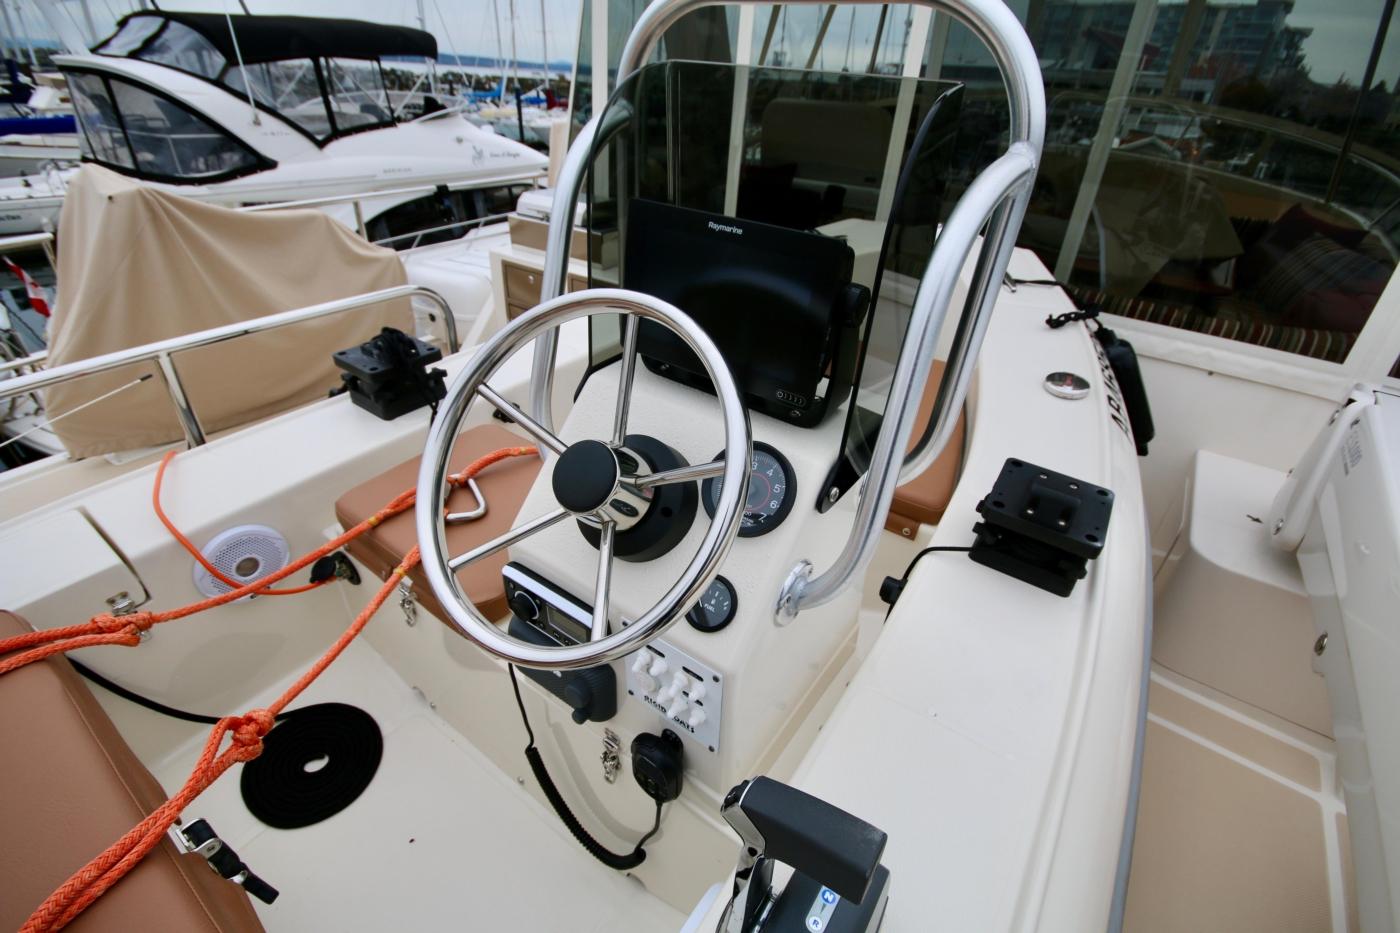 2015 Fleming 58 Pilothouse, Tender controls